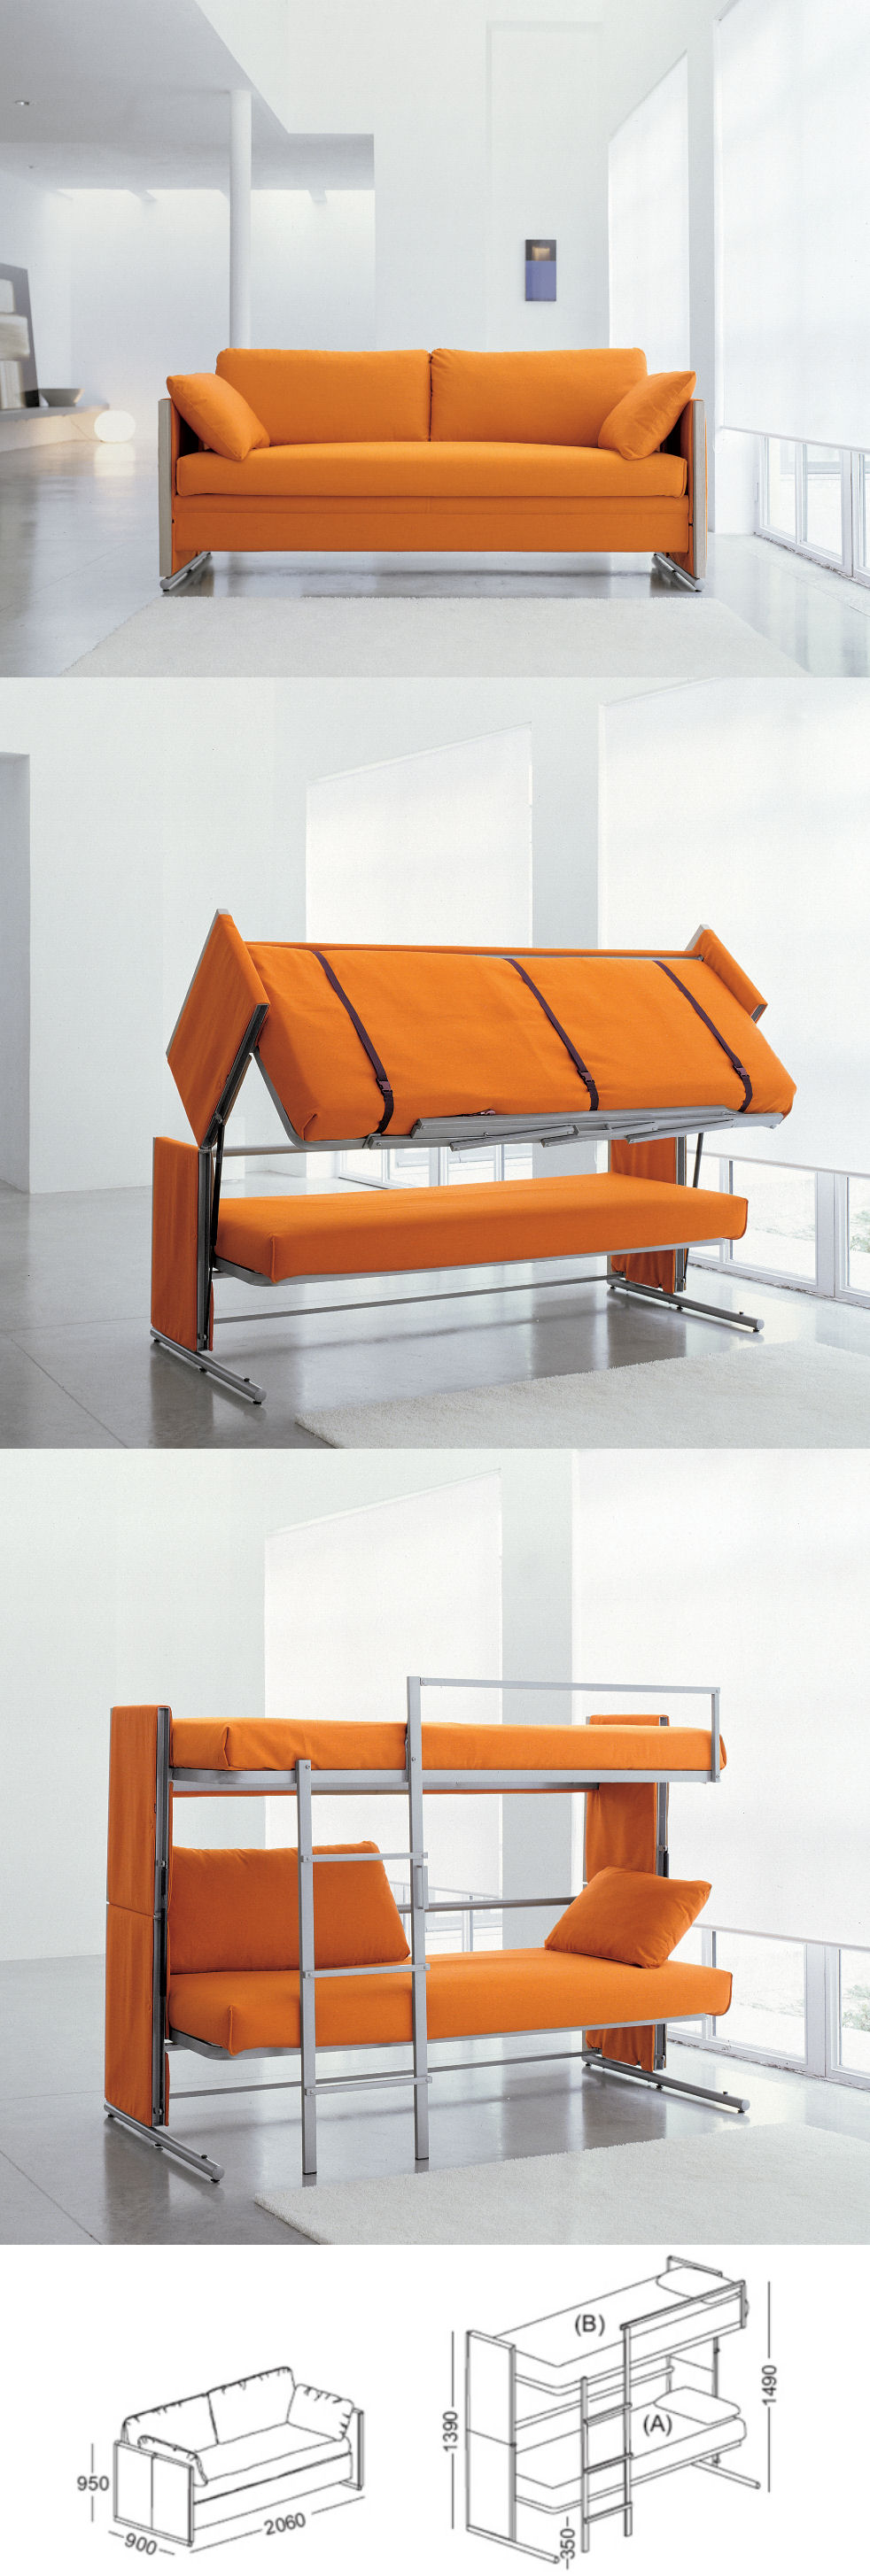 Bonbon Sofa Bunk Bed Alfa Img Showing Bon Bon Sofa Bed Convertible .